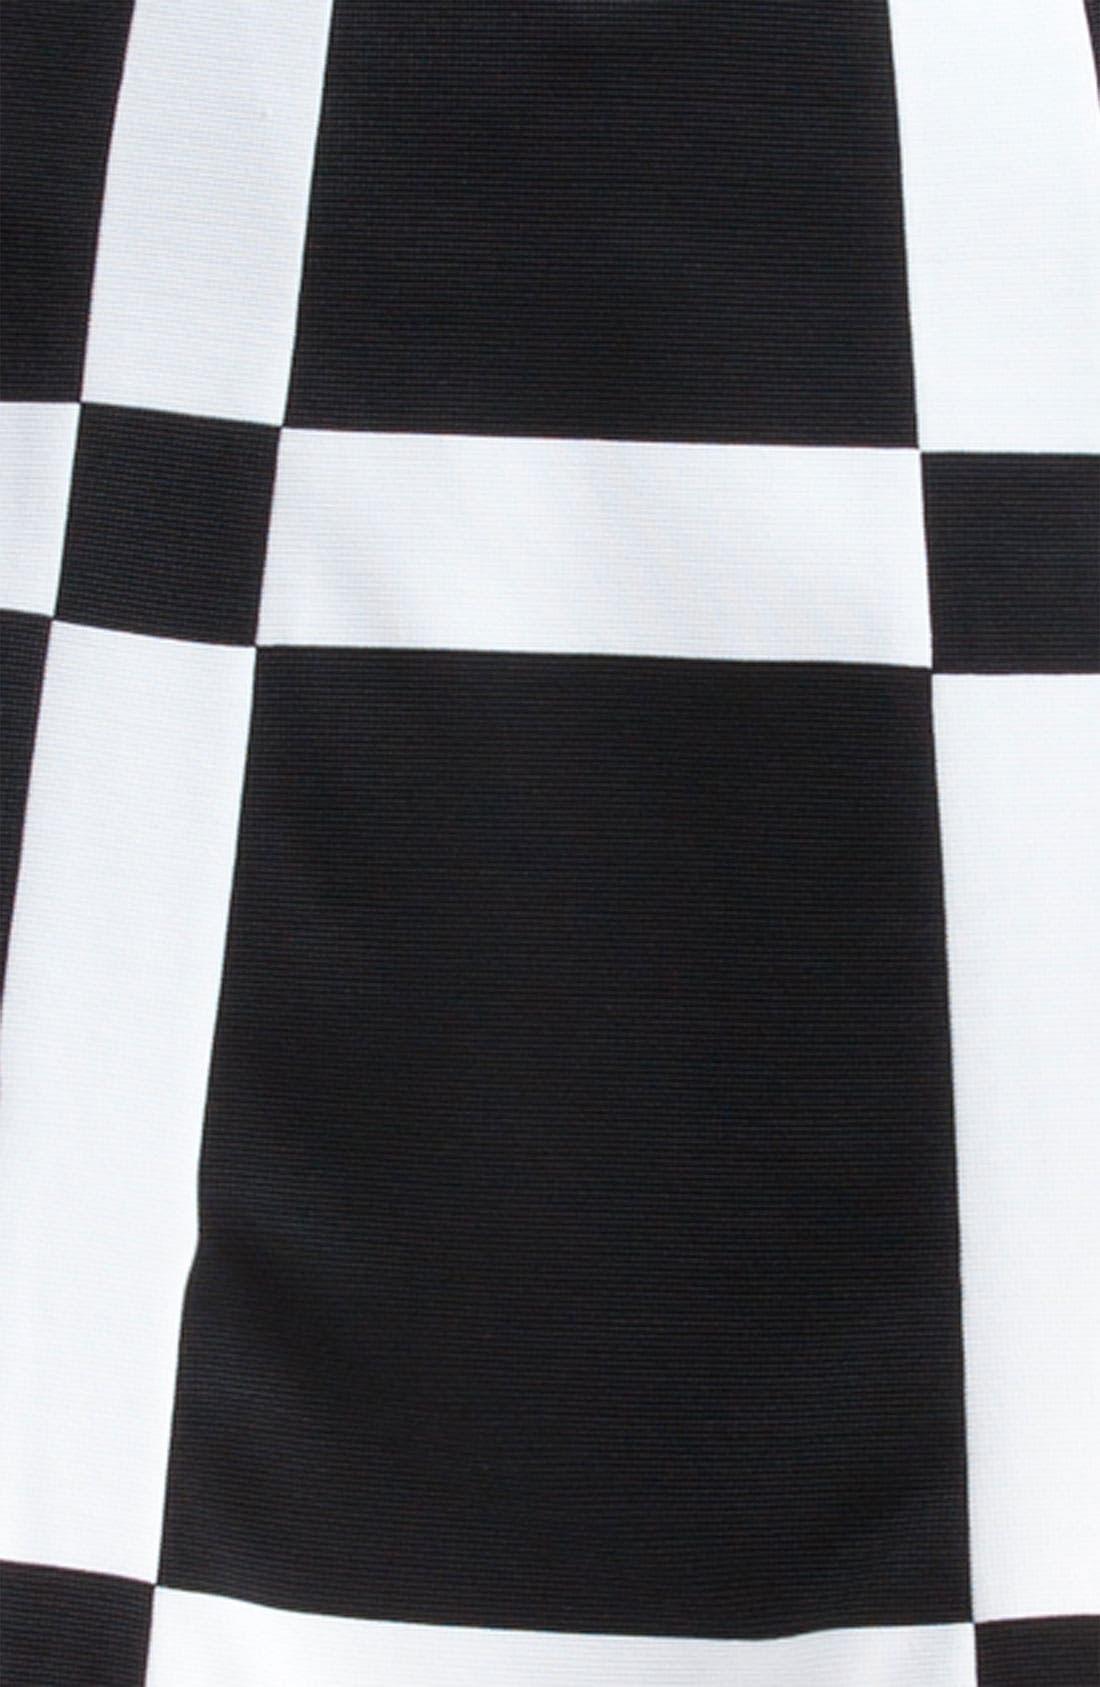 Alternate Image 3  - Marni Edition Grid Print Knit Skirt